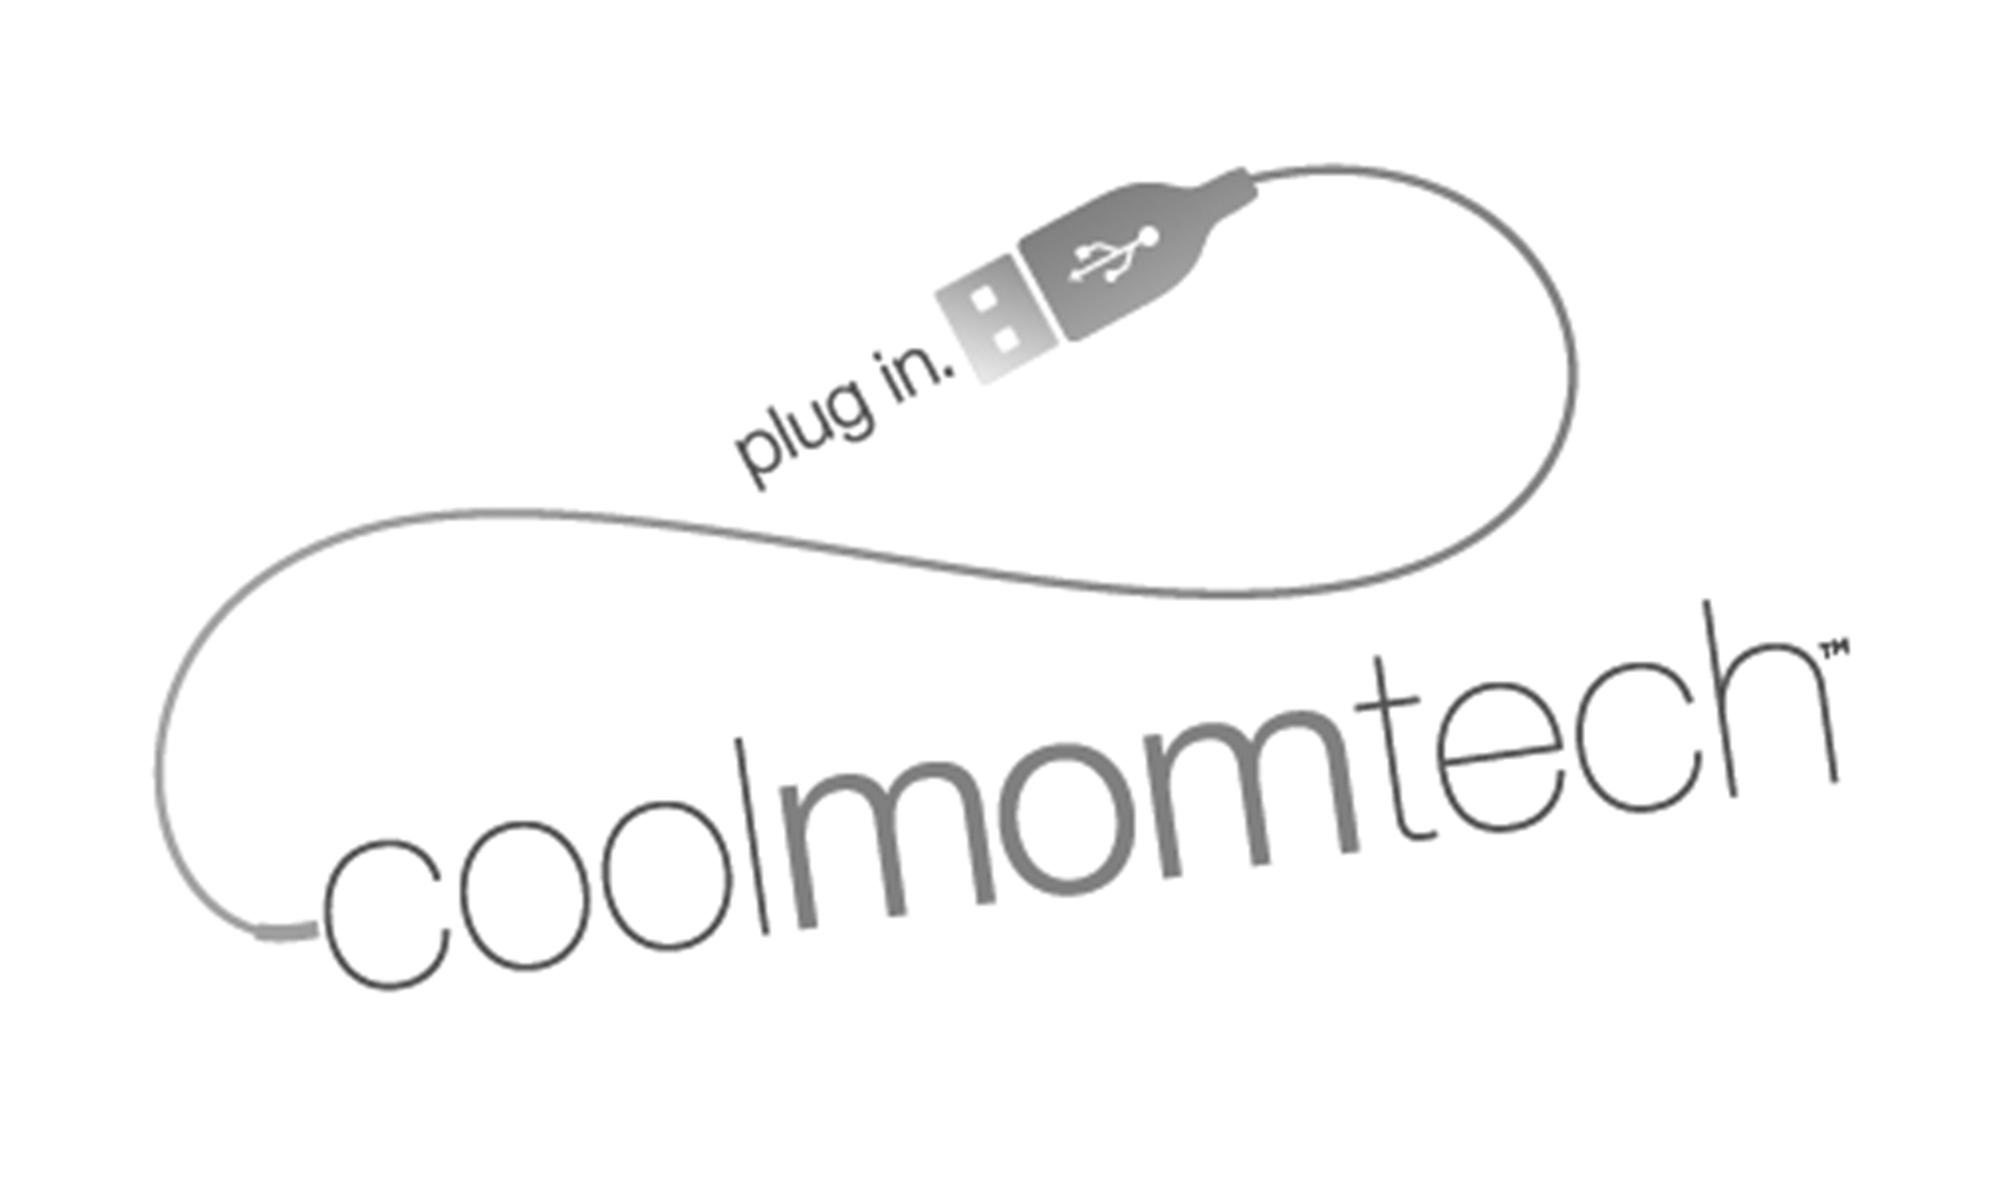 cool-mom-tech-logo.jpg